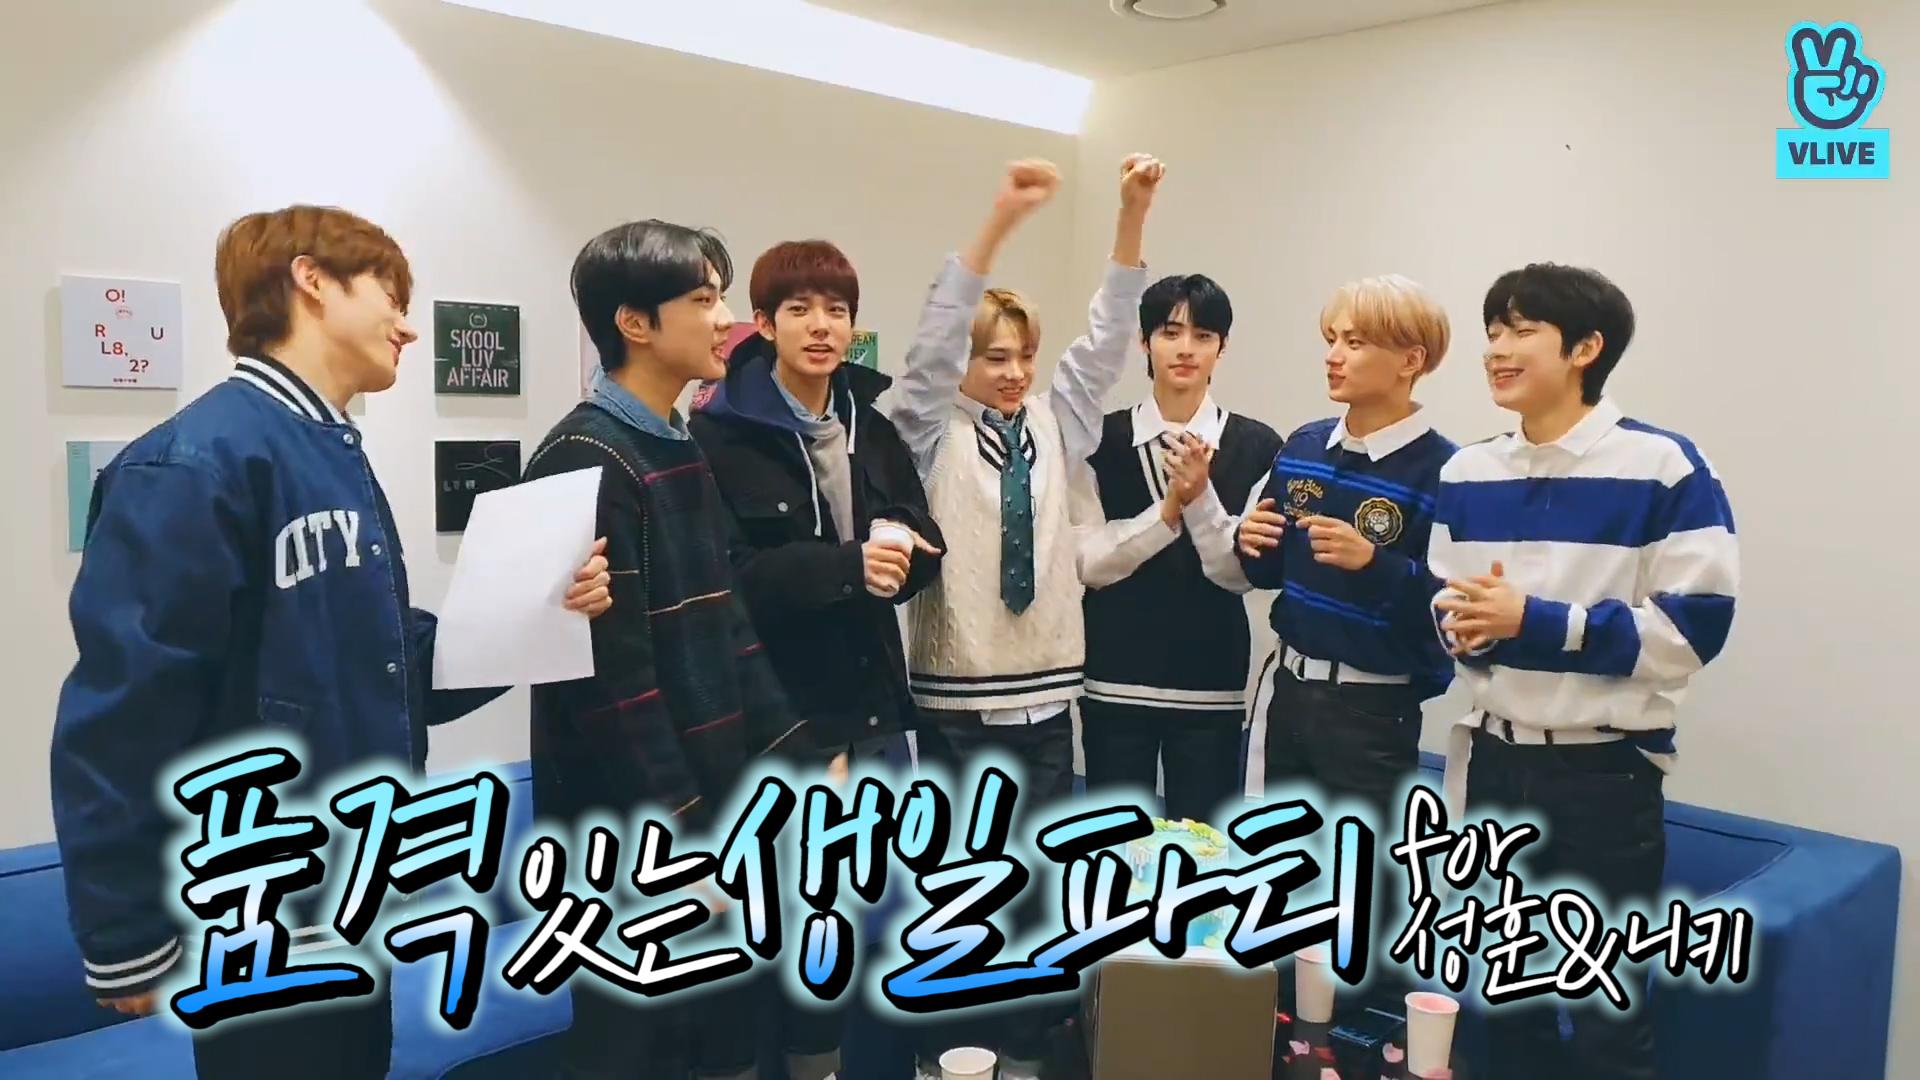 [ENHYPEN] 품격 있고 행복도 있는 🐧🐆생일파티에 어서오세요!! (Happy SUNGHOON & NI-KI Day!)